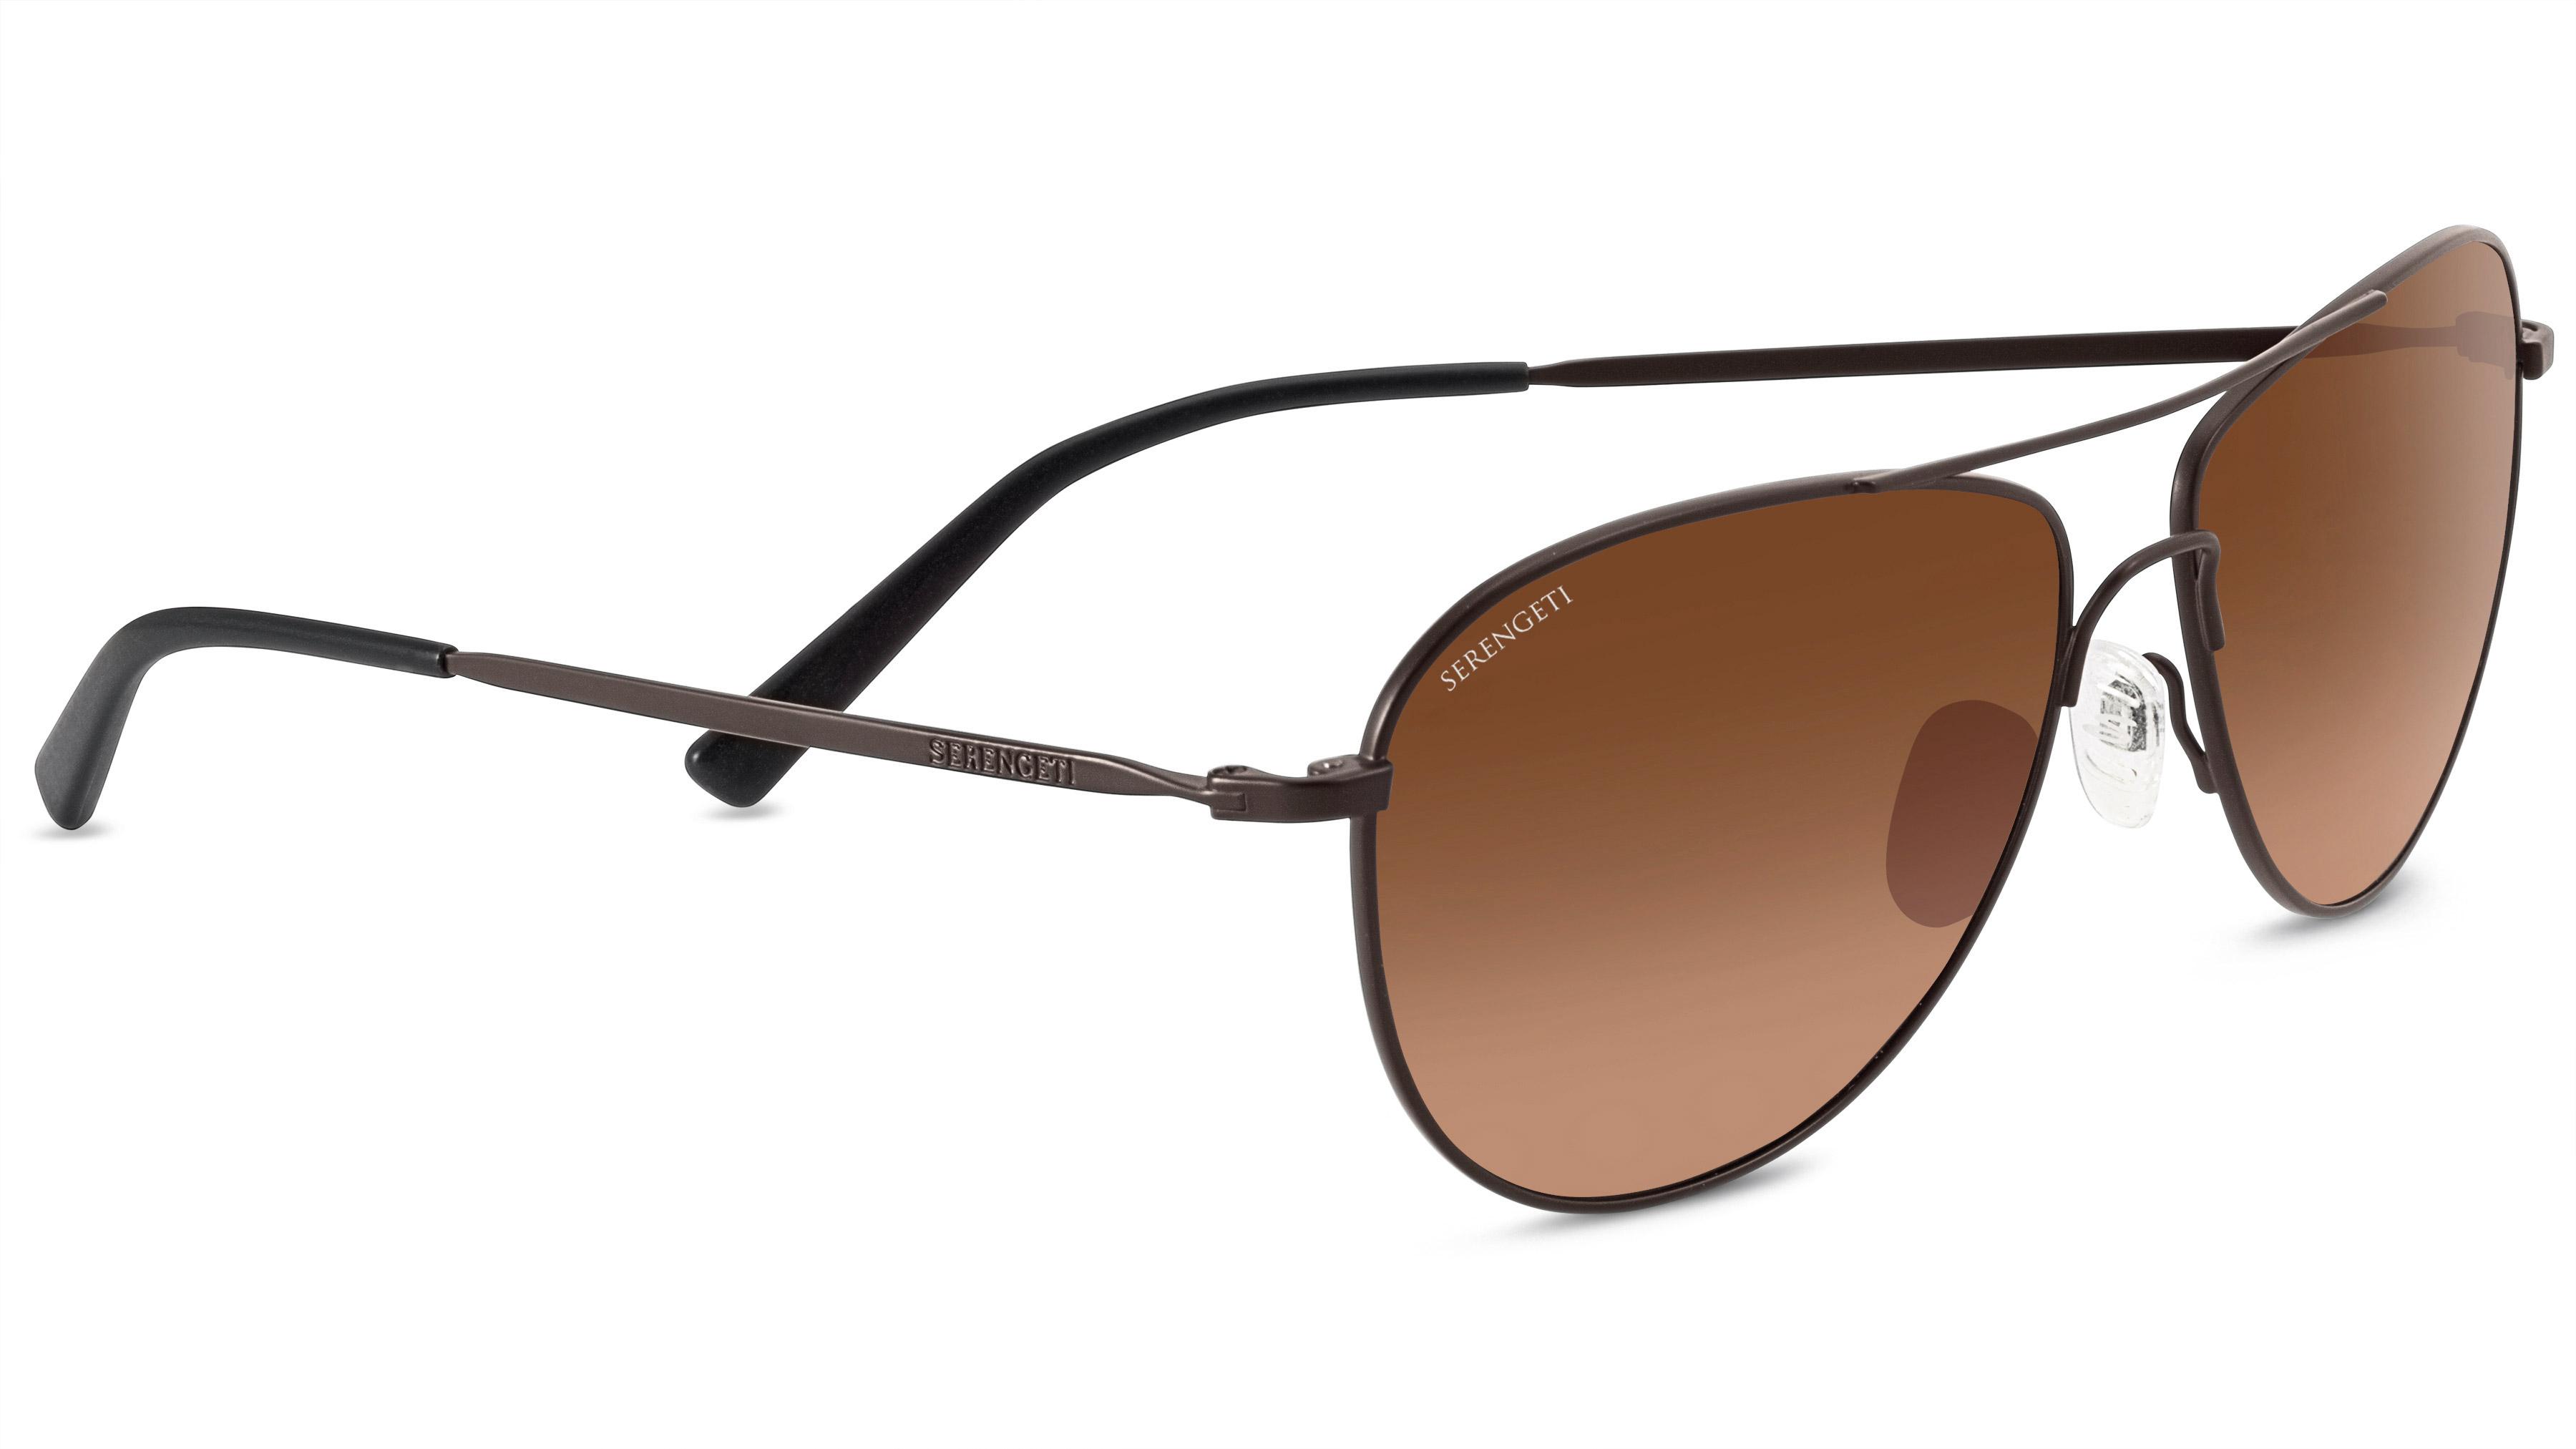 491a2763342f Serengeti Alghero Sunglasses